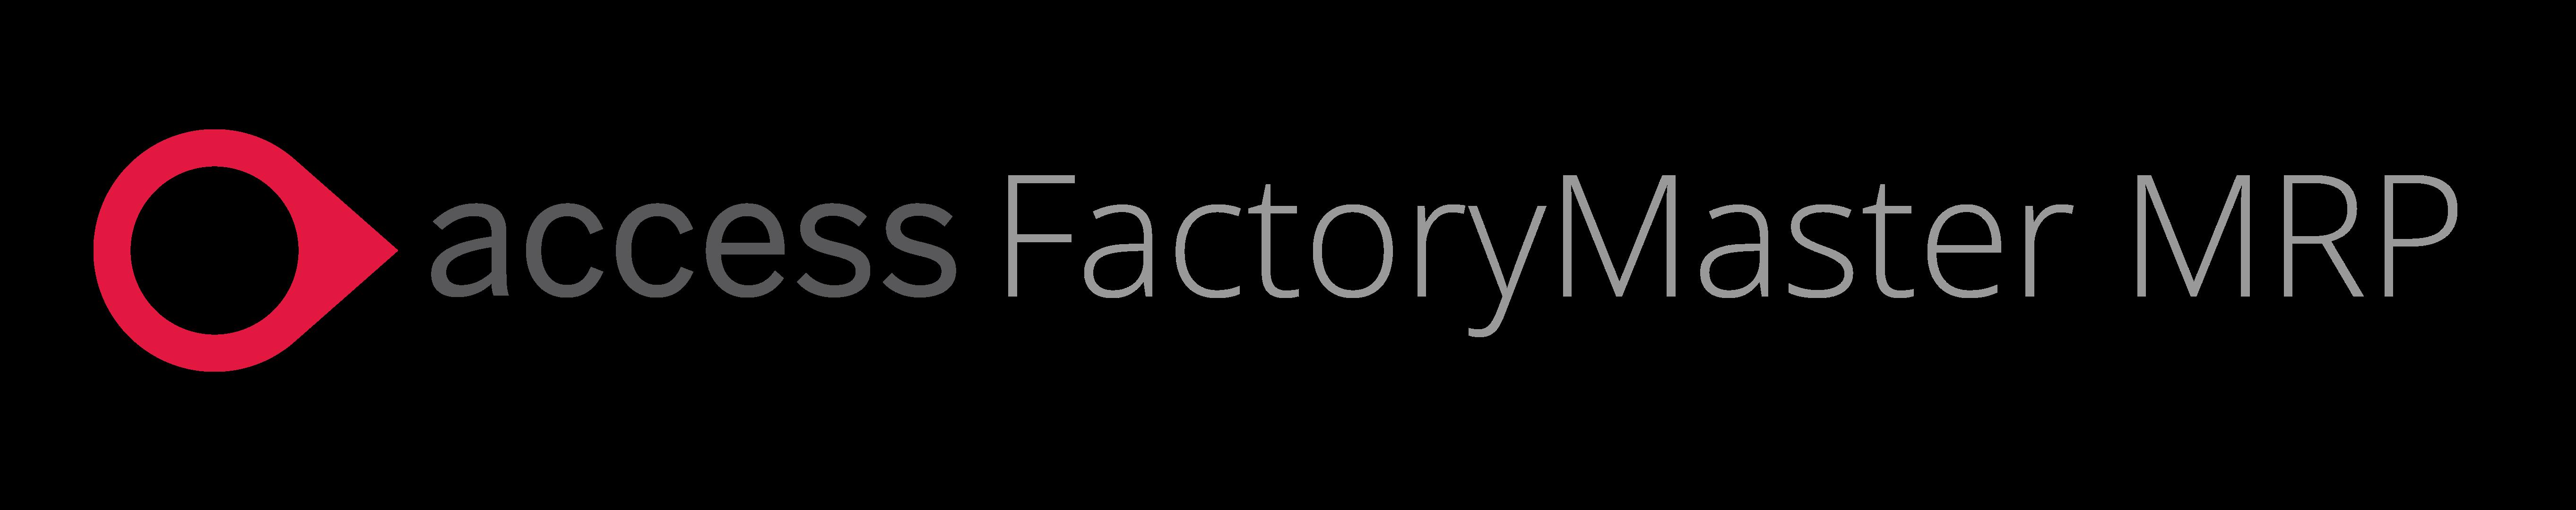 Access FactoryMaster MRP